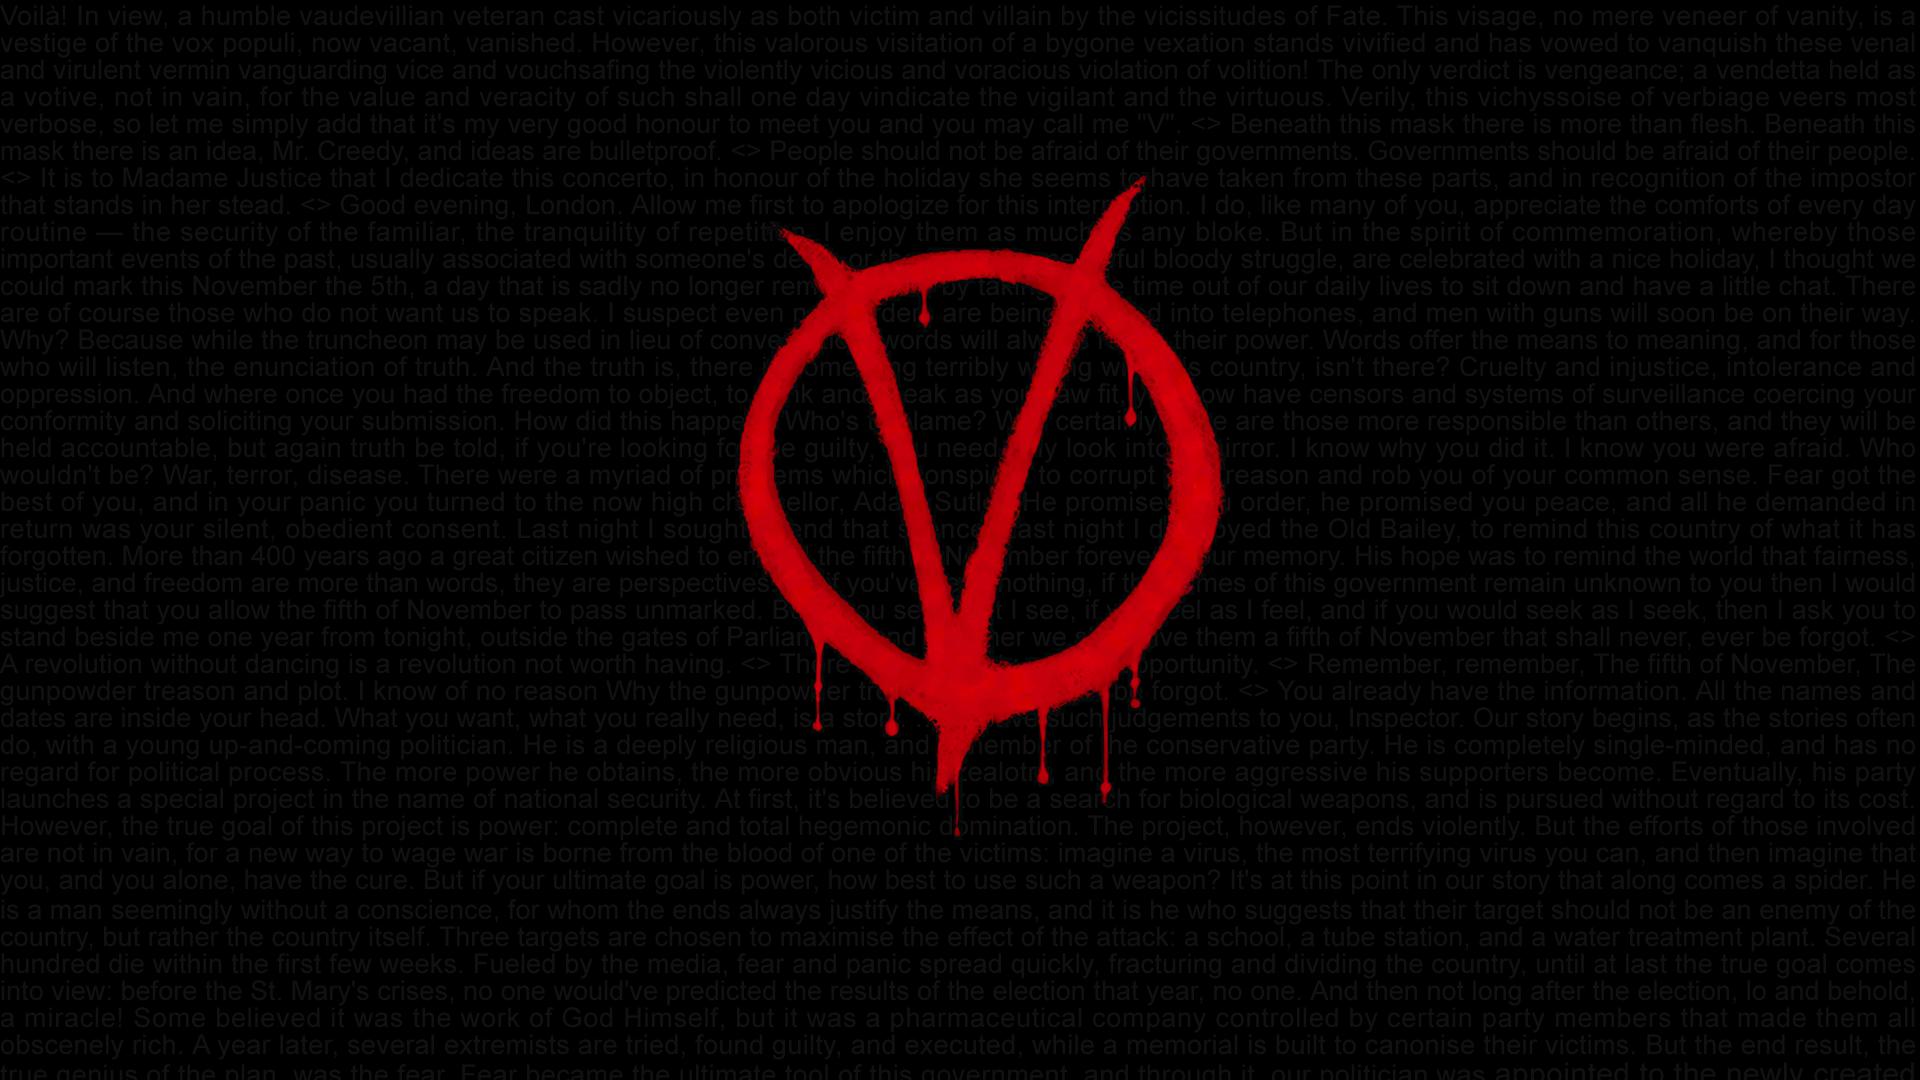 For Vendetta Wallpaper Hd wallpaper   892117 1920x1080